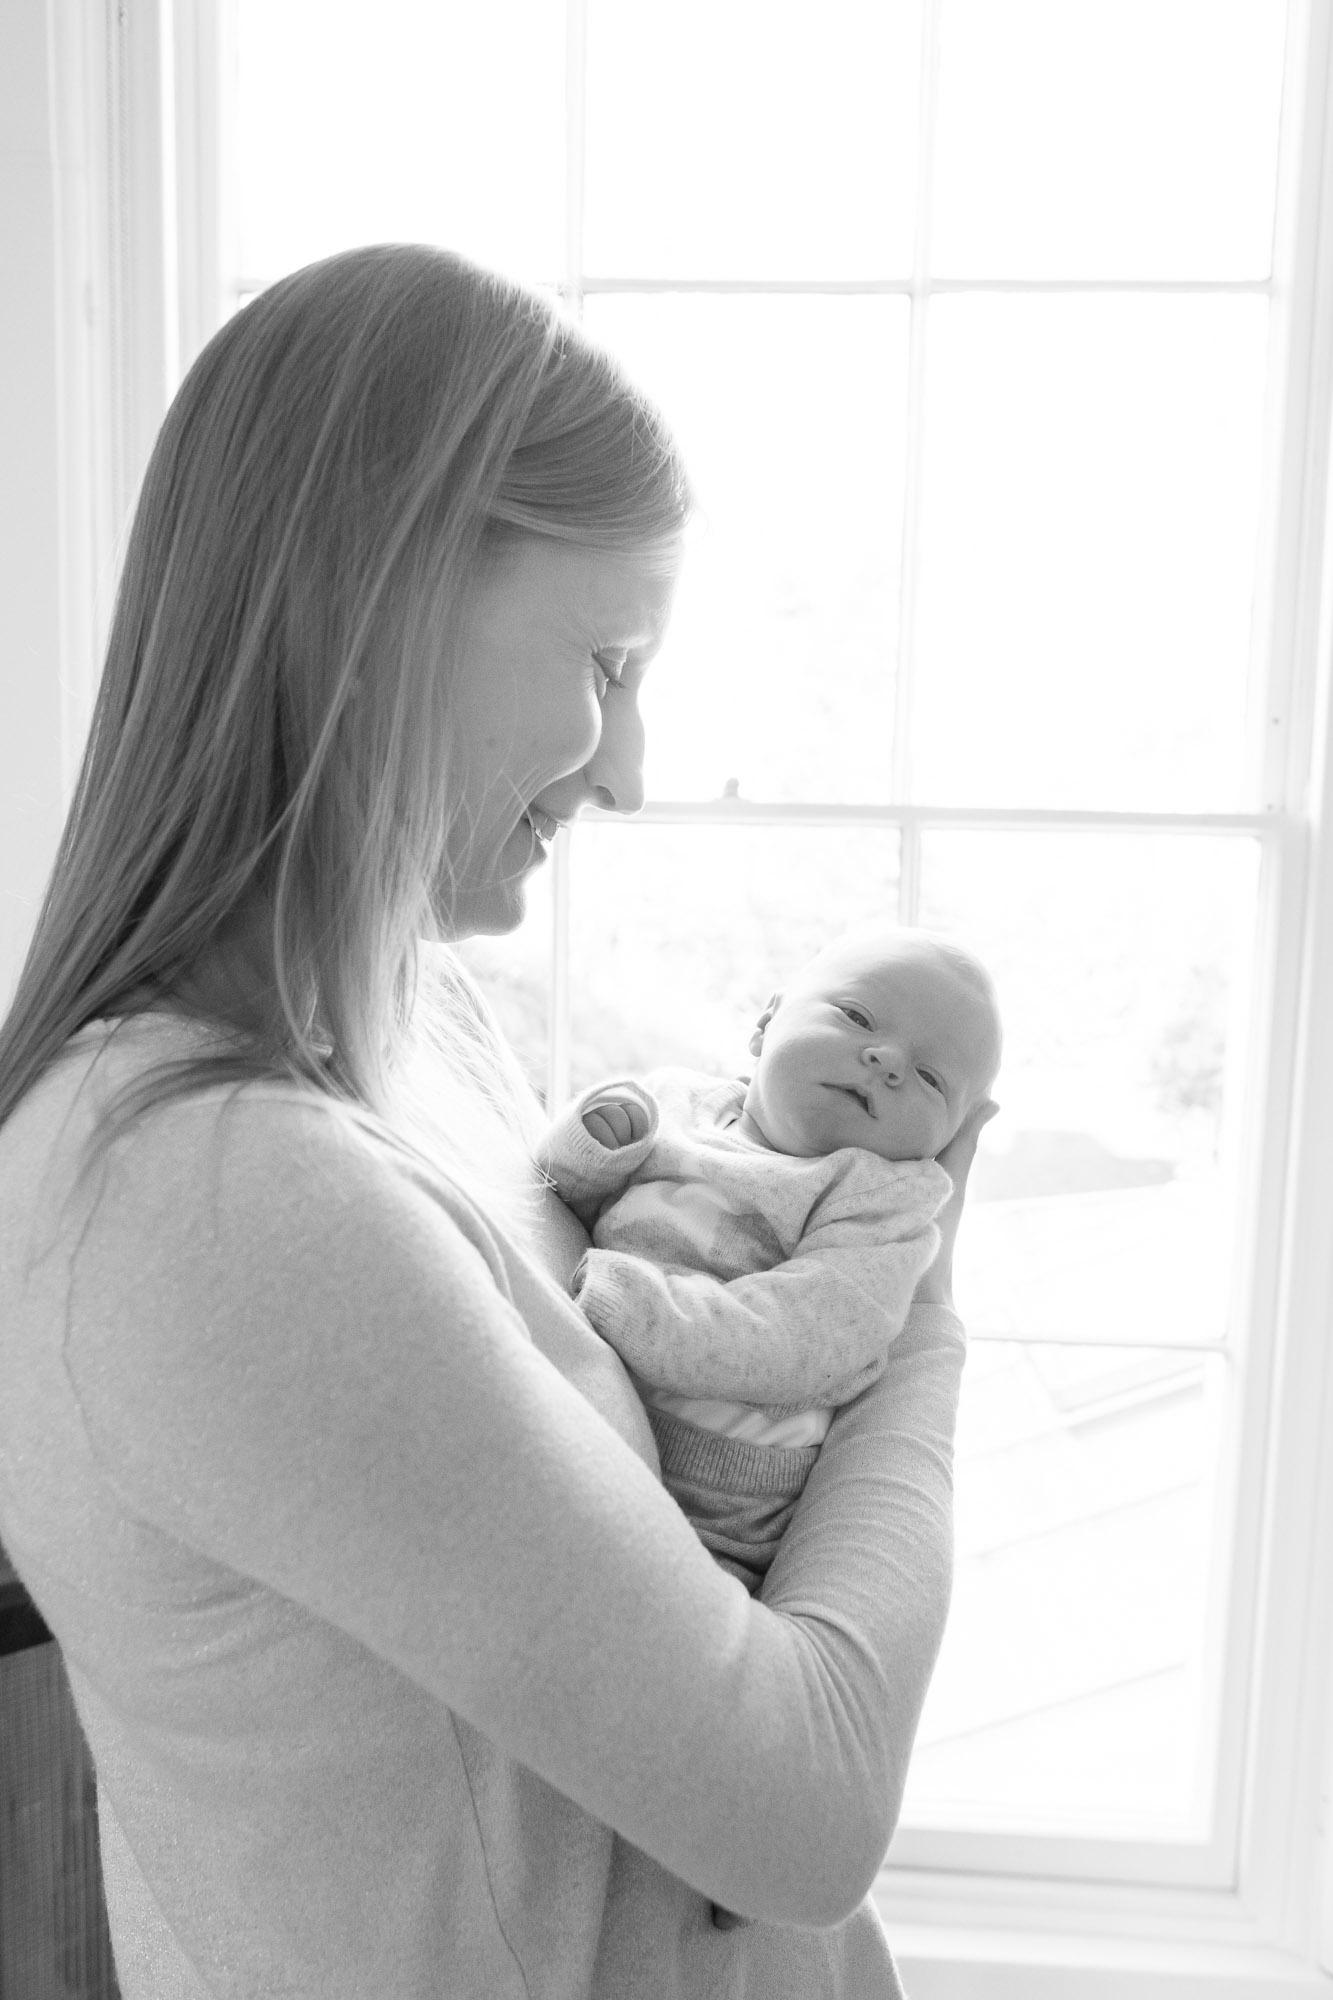 newborn-baby-family-portrait-photographer-022.jpg